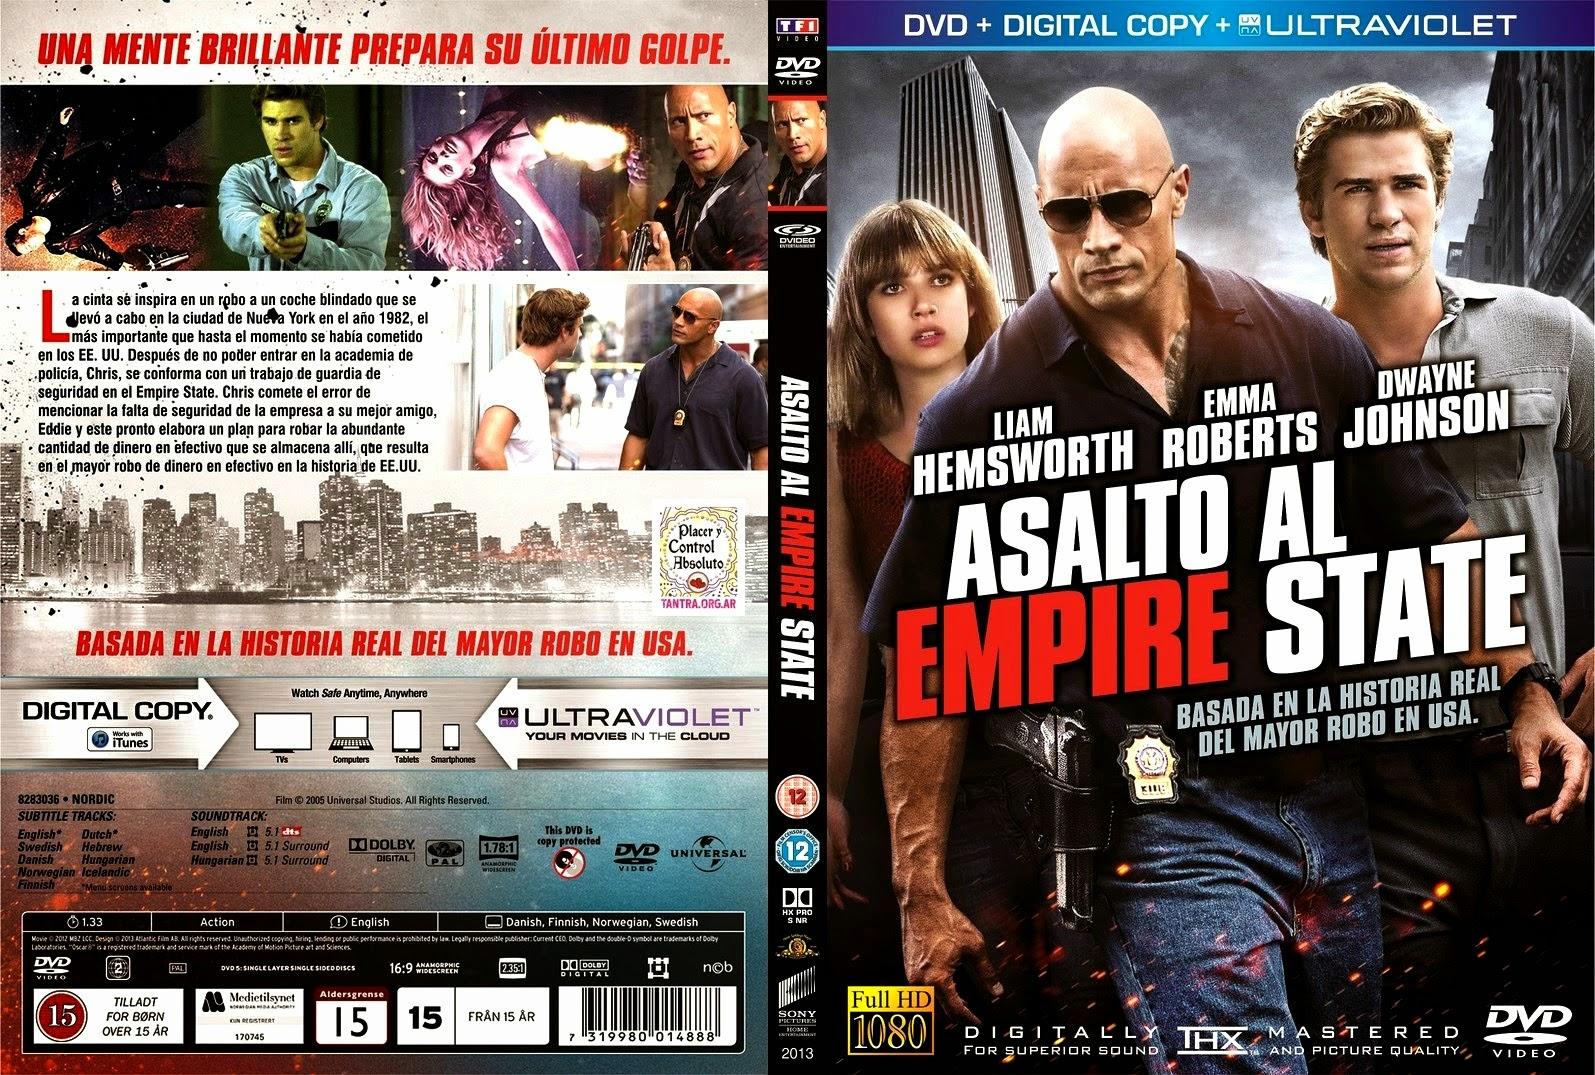 Empire State 2C Asalto al Empire State coverdvdgratis blogspot V1 jpgEmpire State Dvd Cover